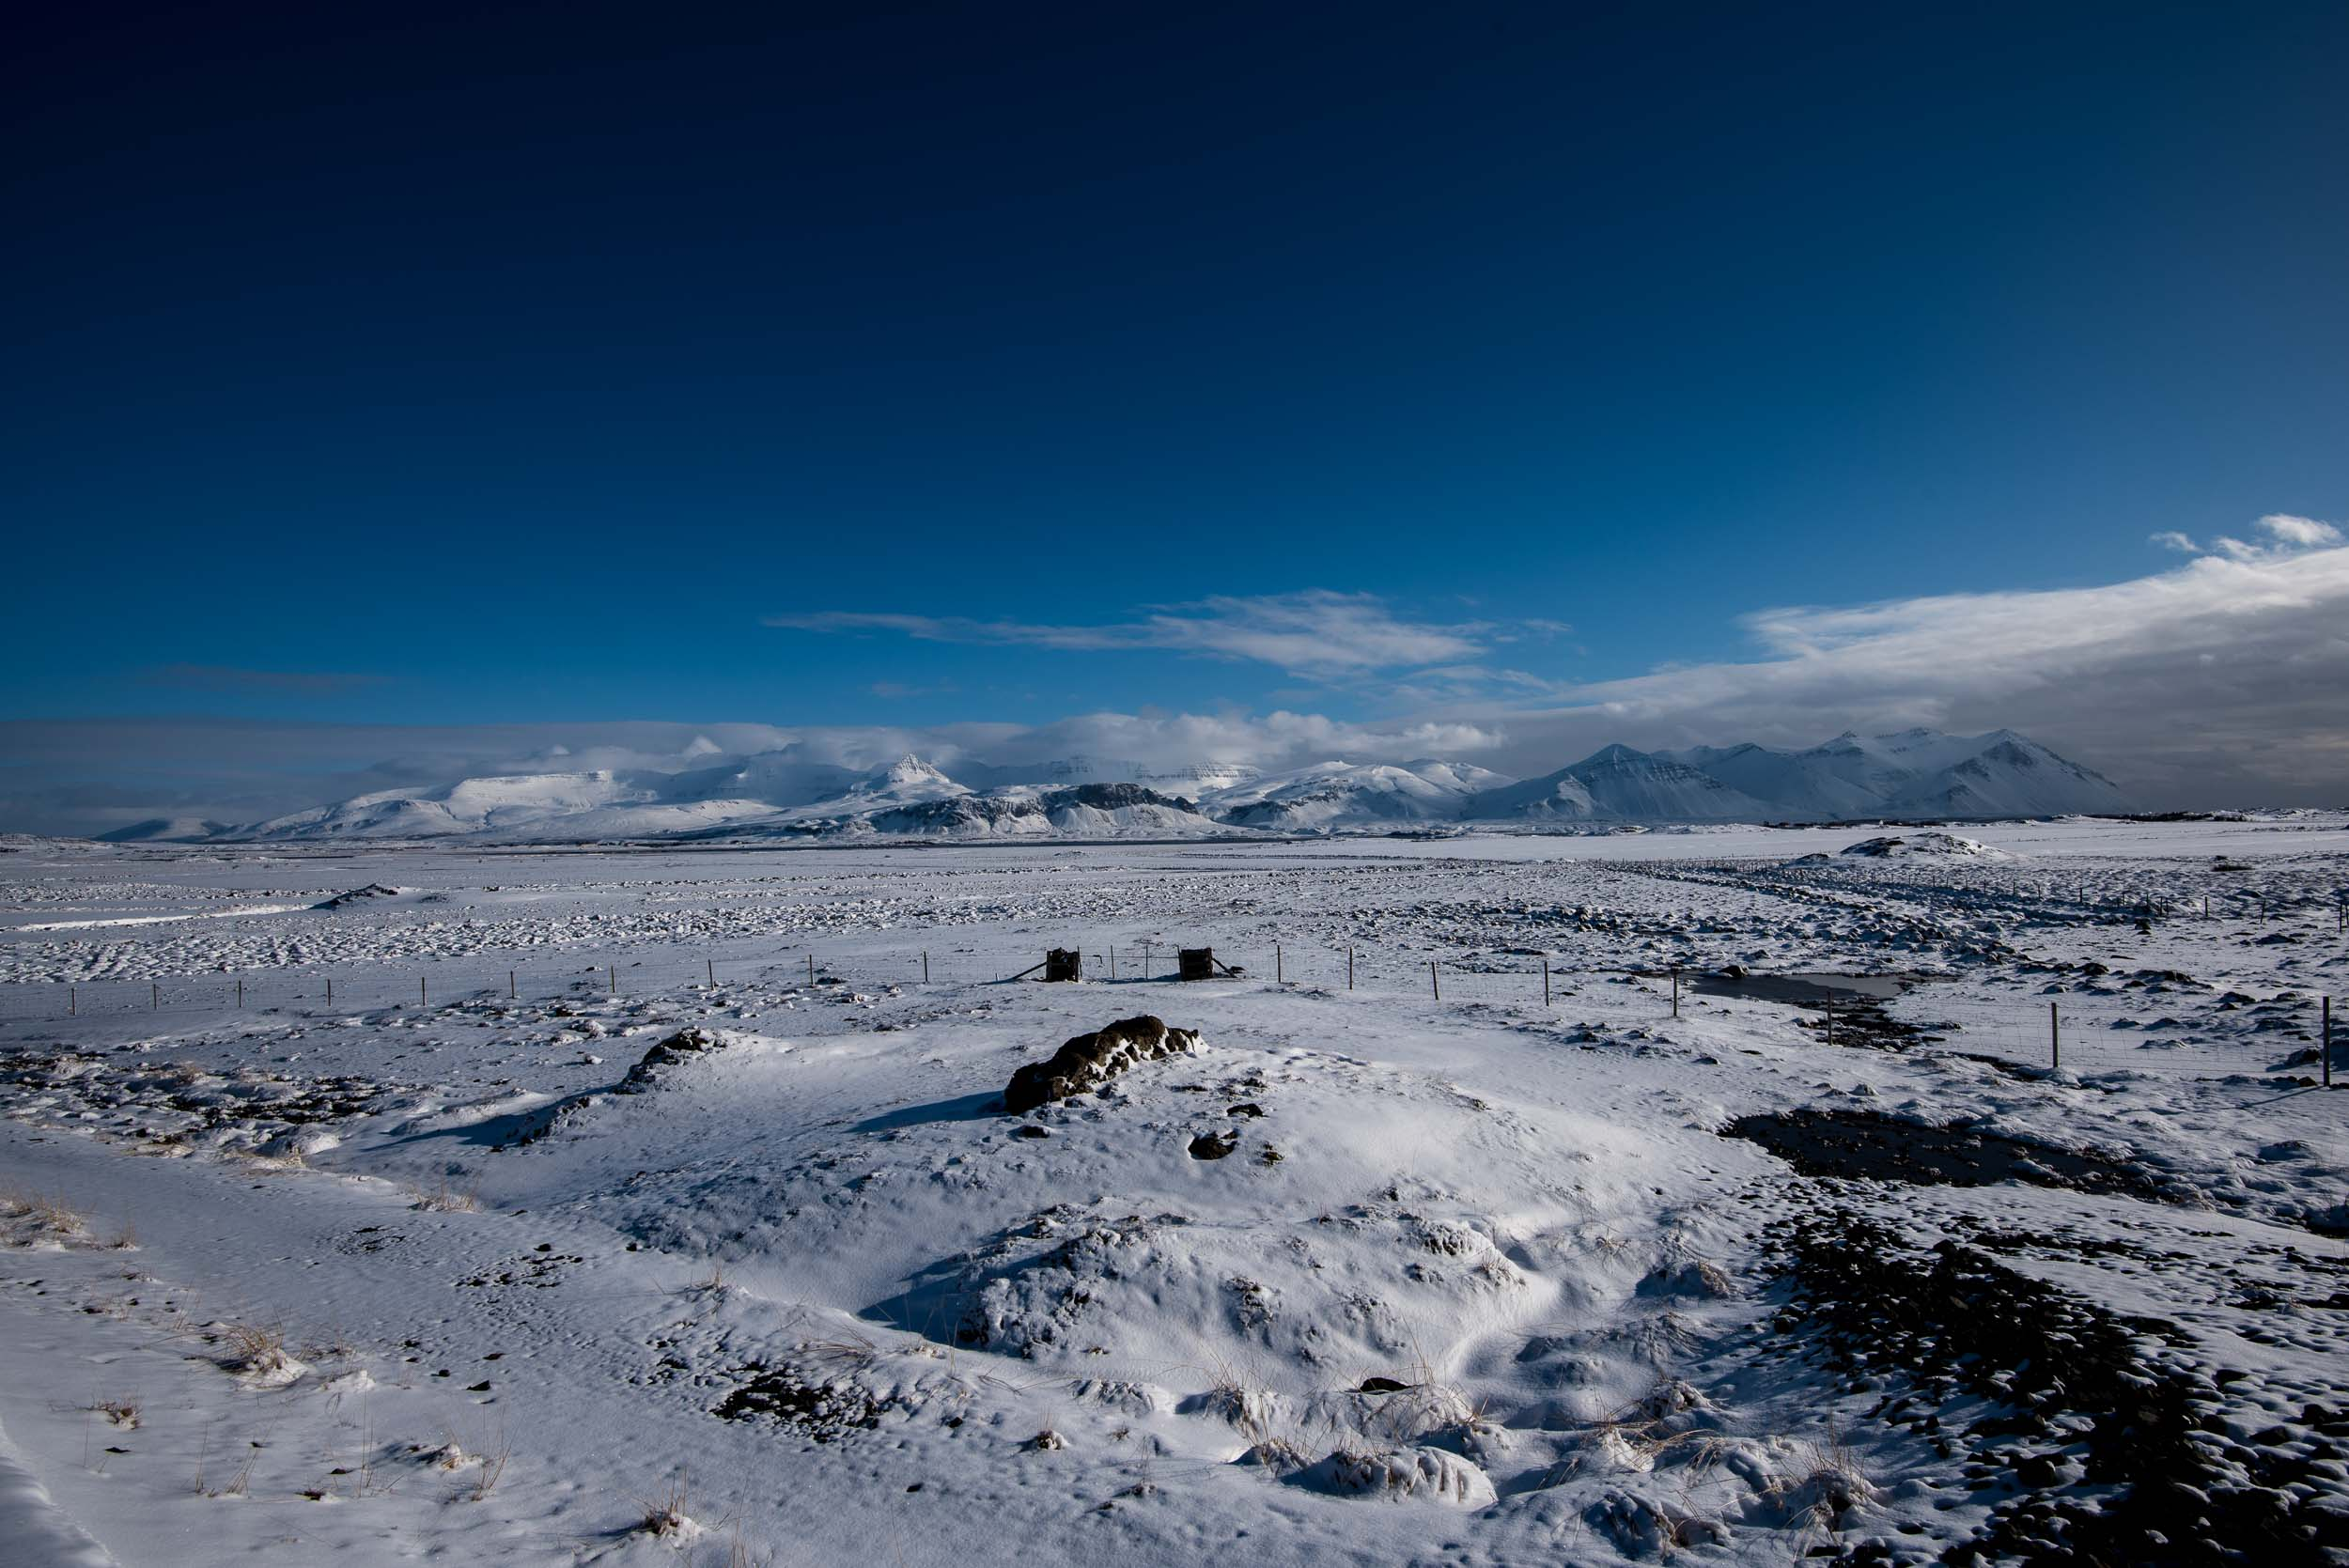 Snowy valley somewhere in Northern Iceland